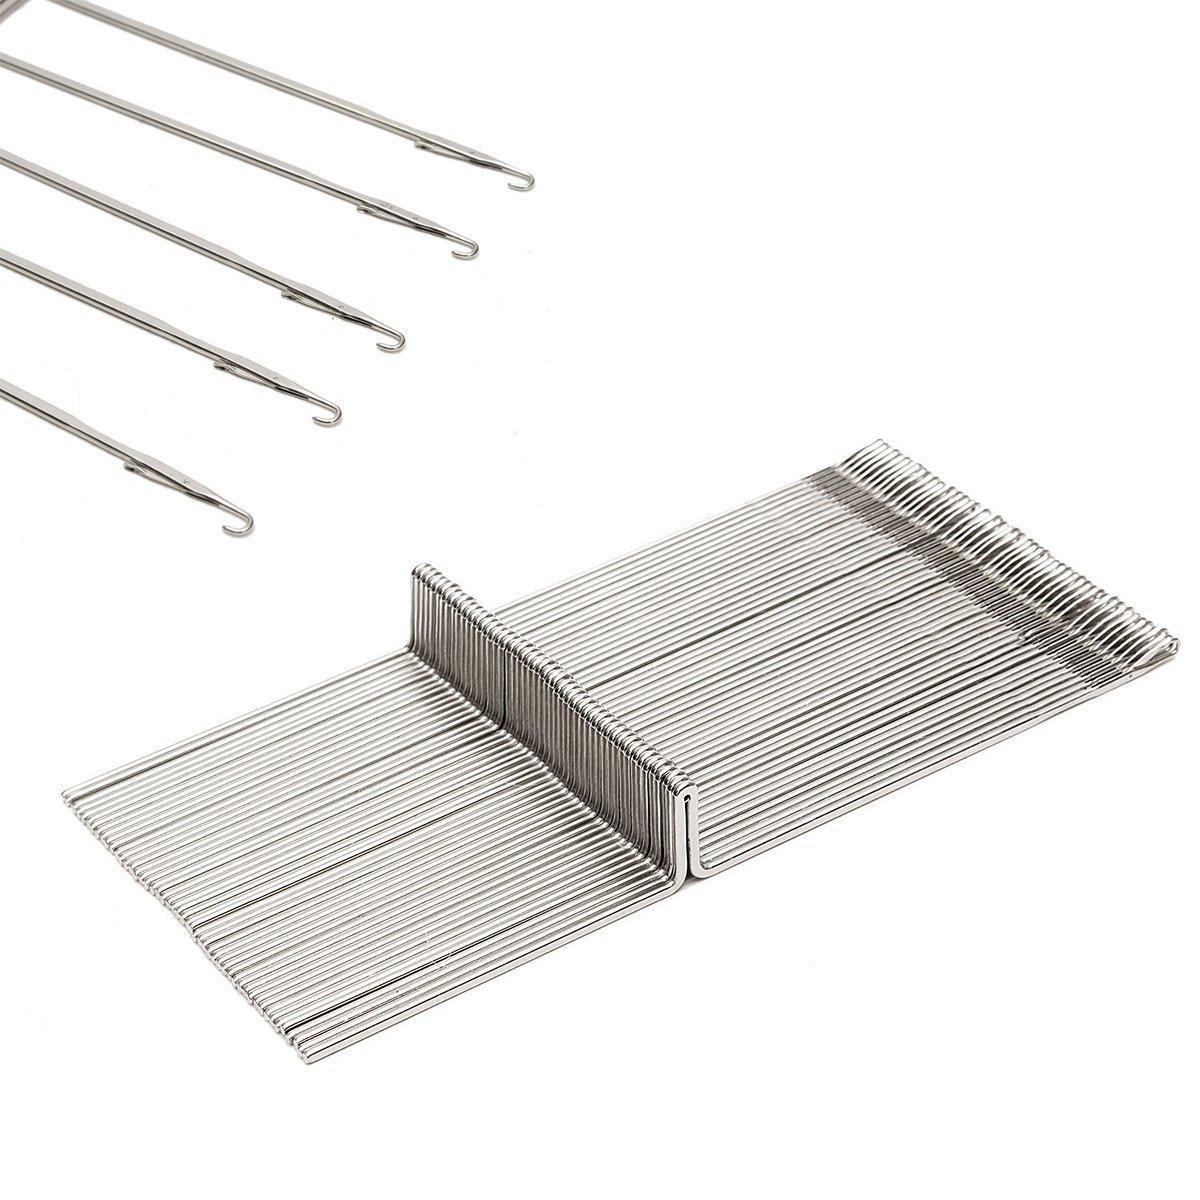 50Pcs Knitting Needles for Brother Knitting Machine KH820 KH830 KH860 KH881 KH868 KH940 KH970